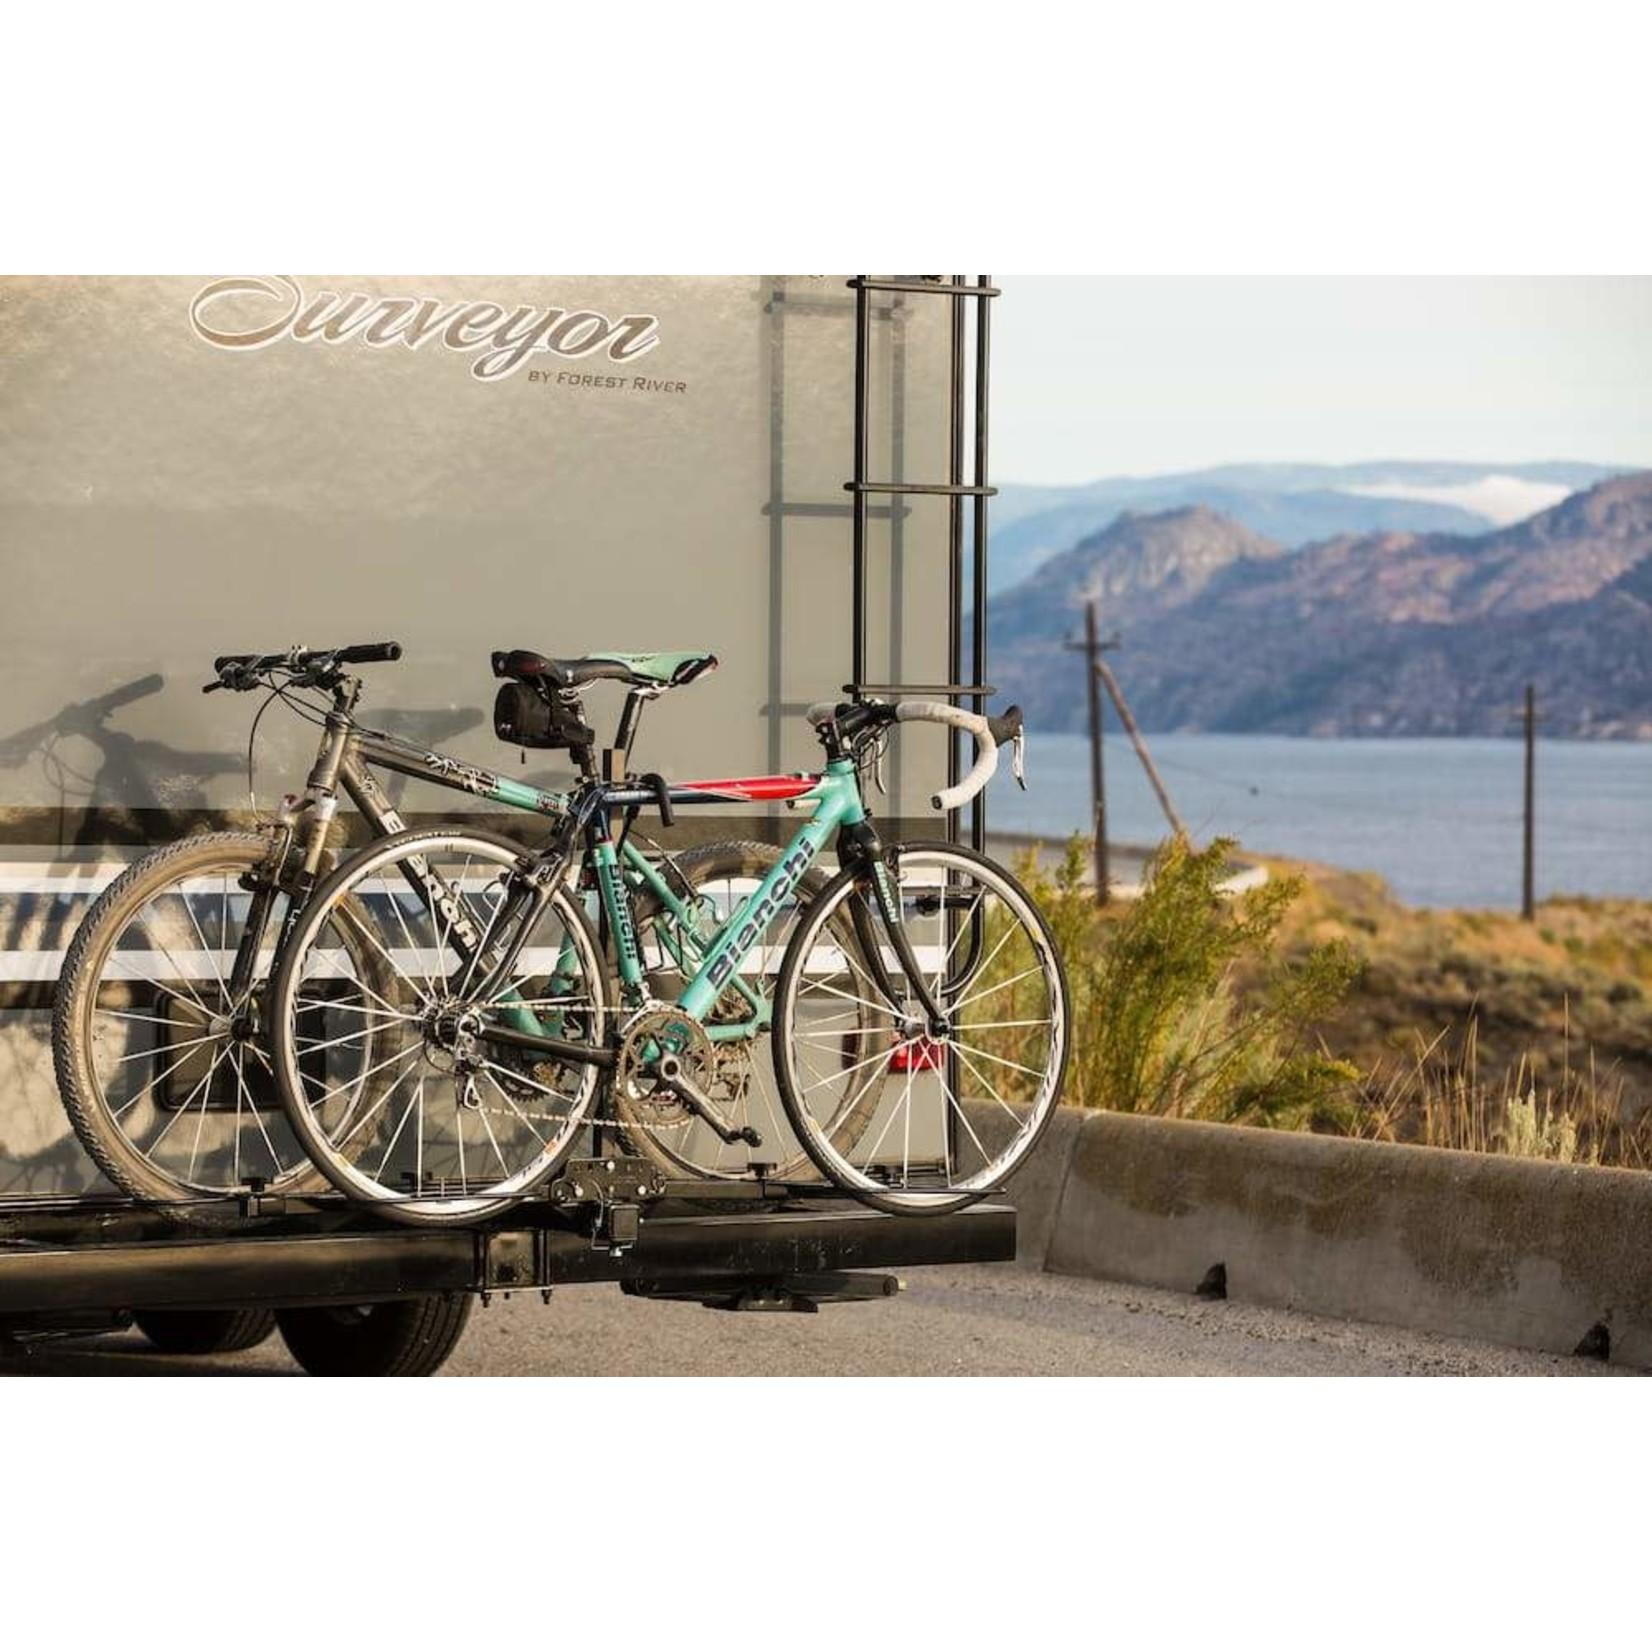 Swagman Swagman Bike Rack, Traveler XC 2 RV Bumper Mount